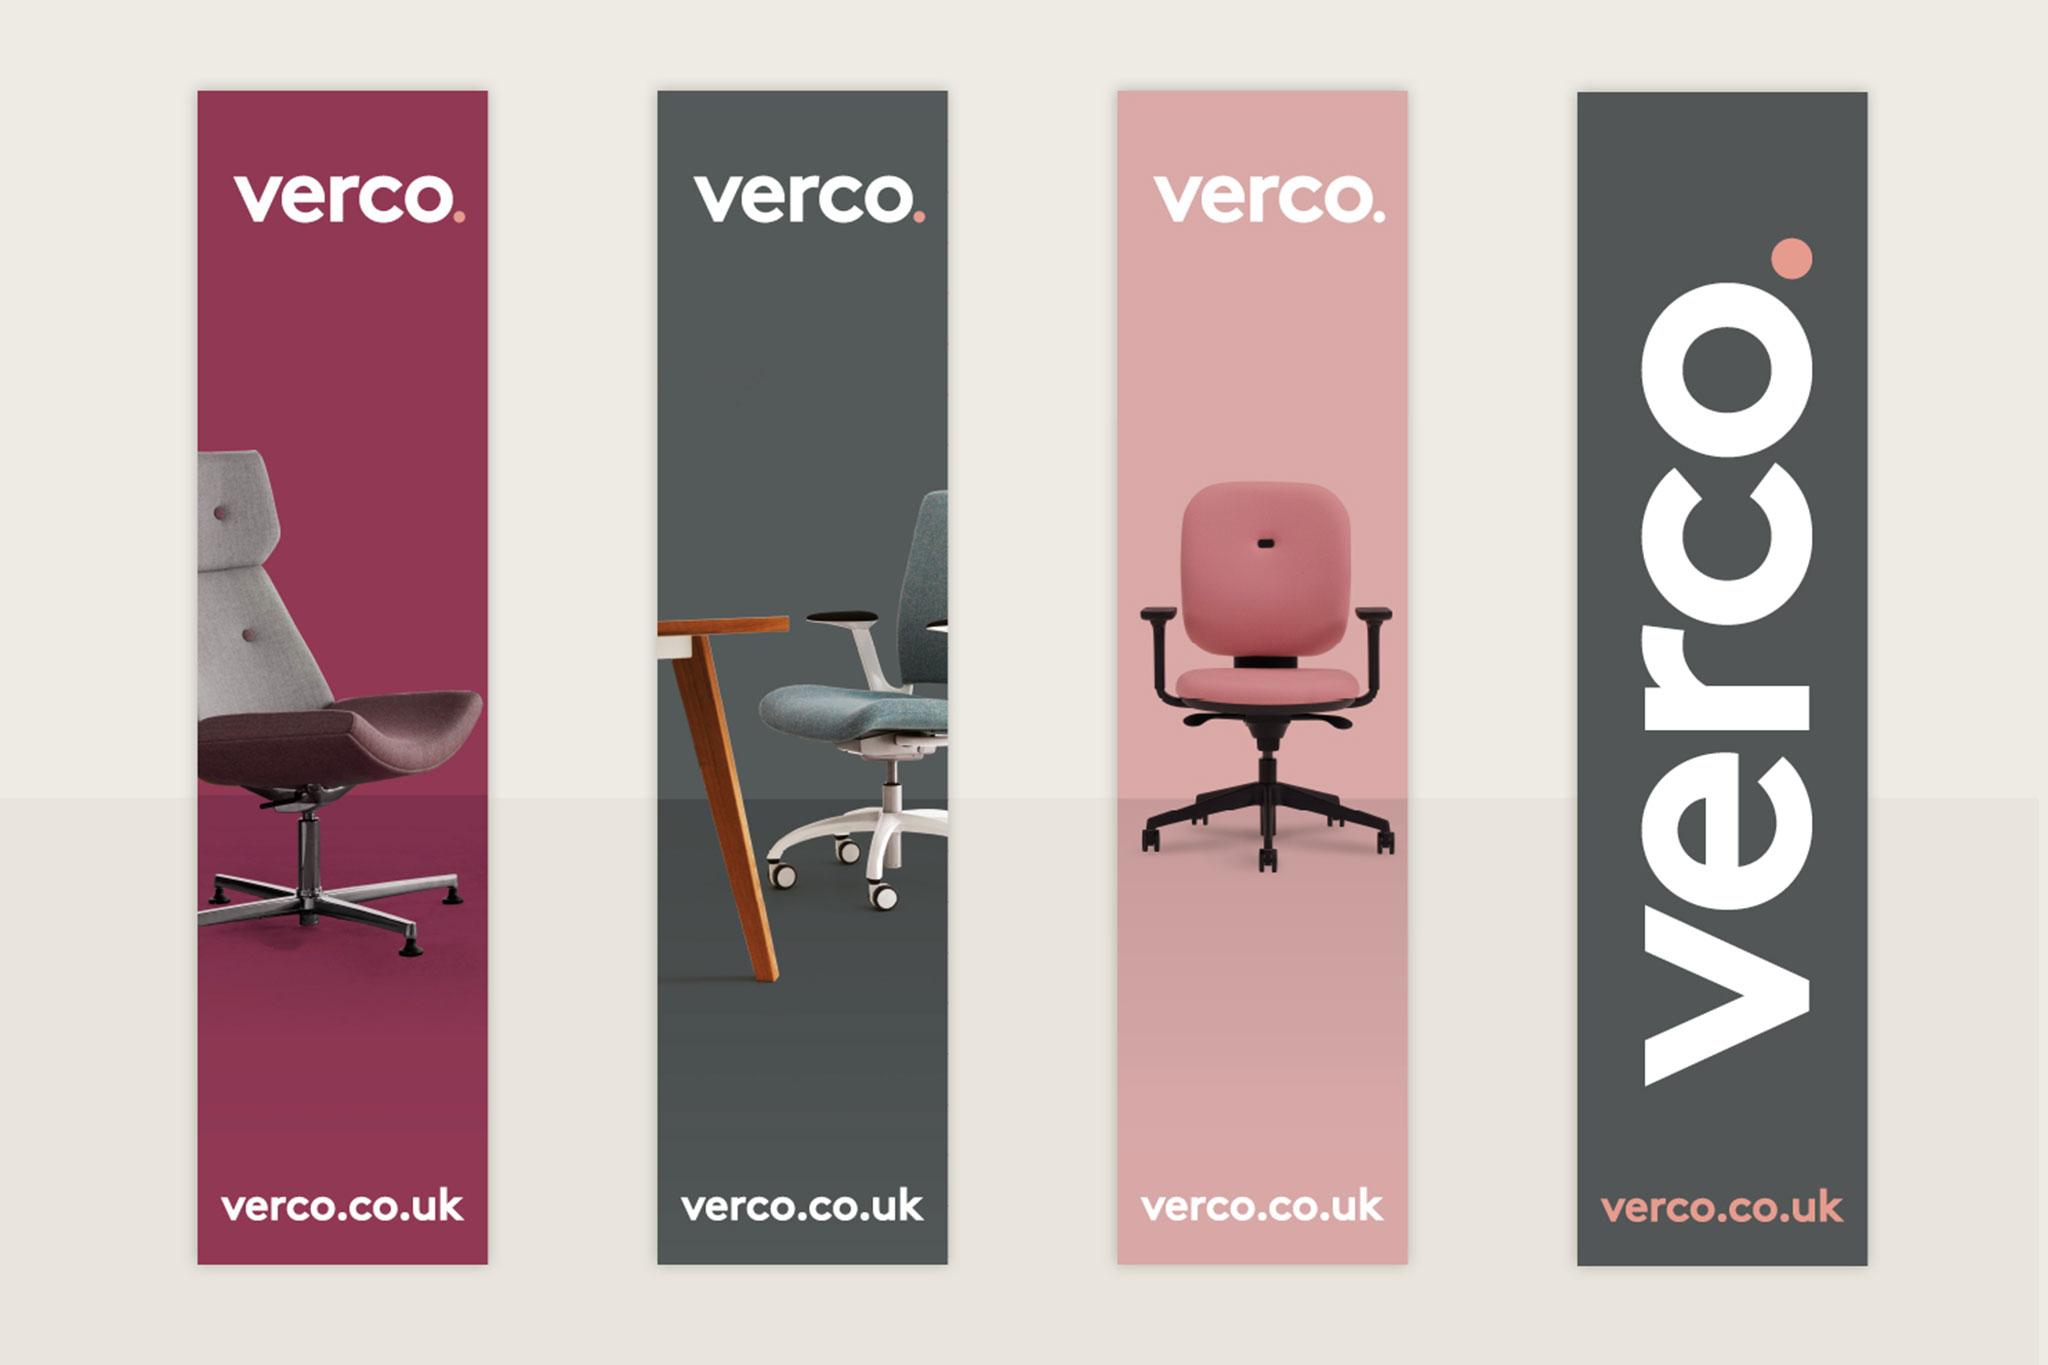 verco_banners